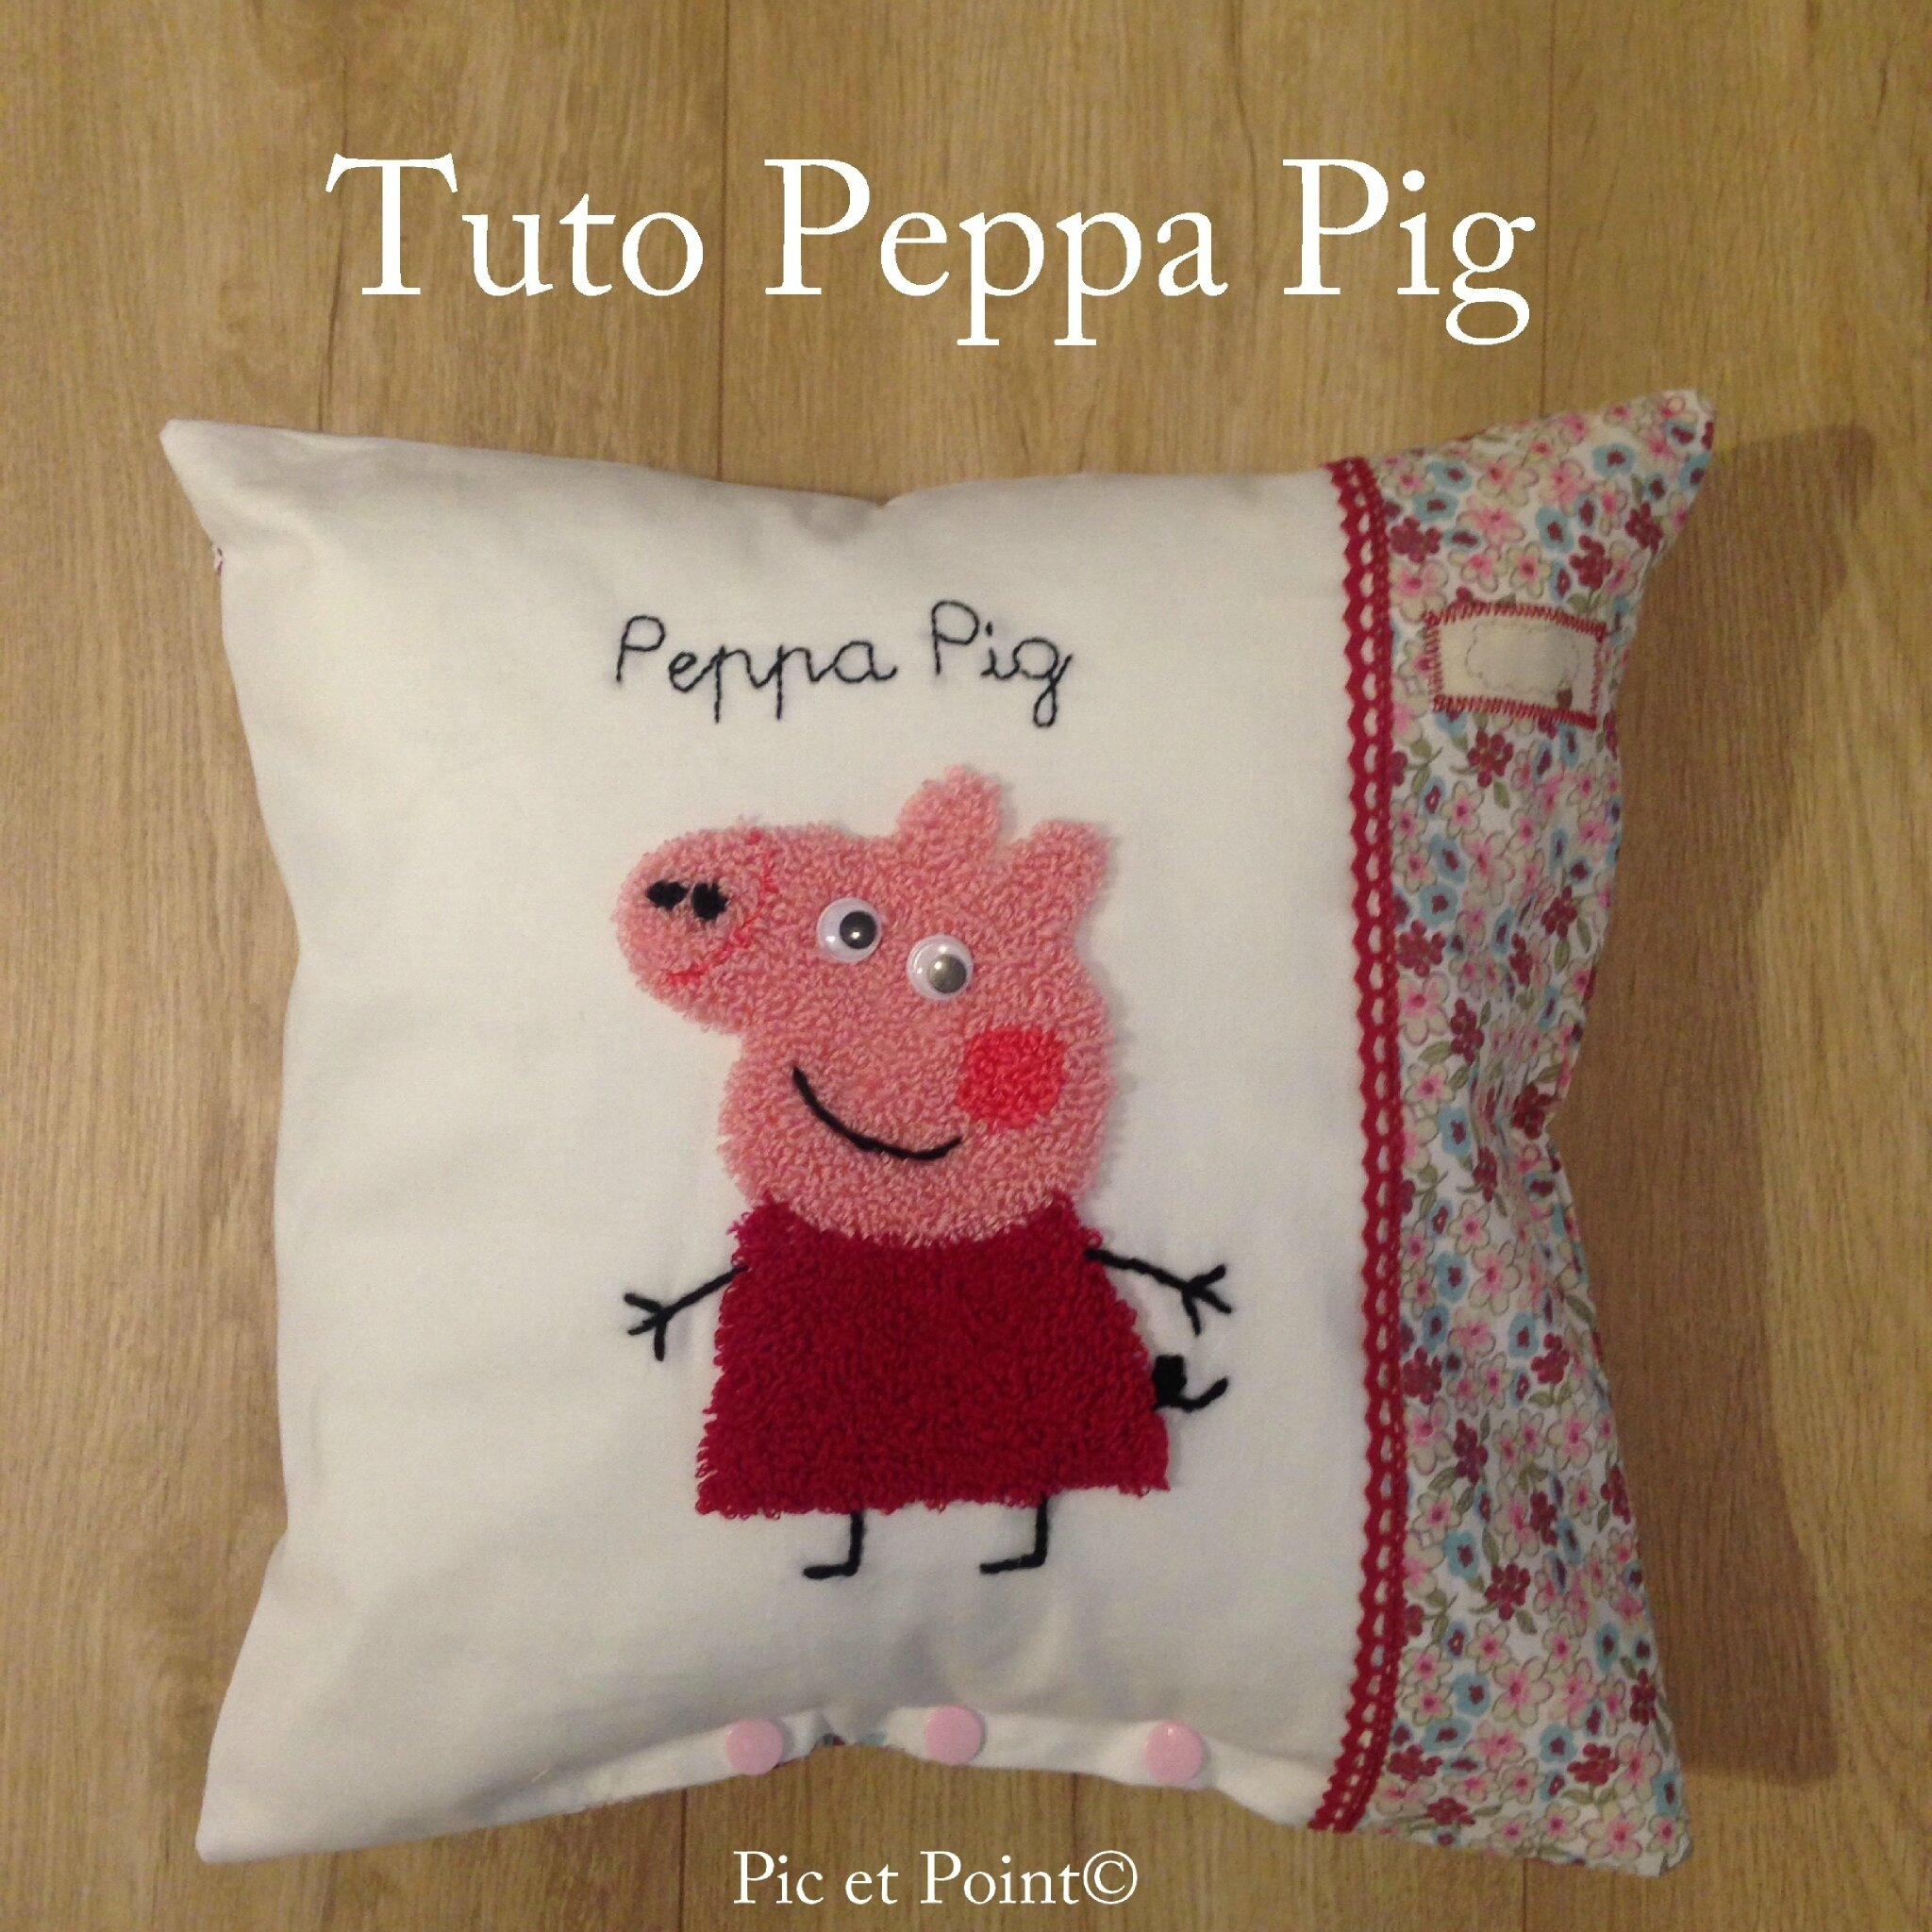 Tuto Peppa Pig Punch Needle...